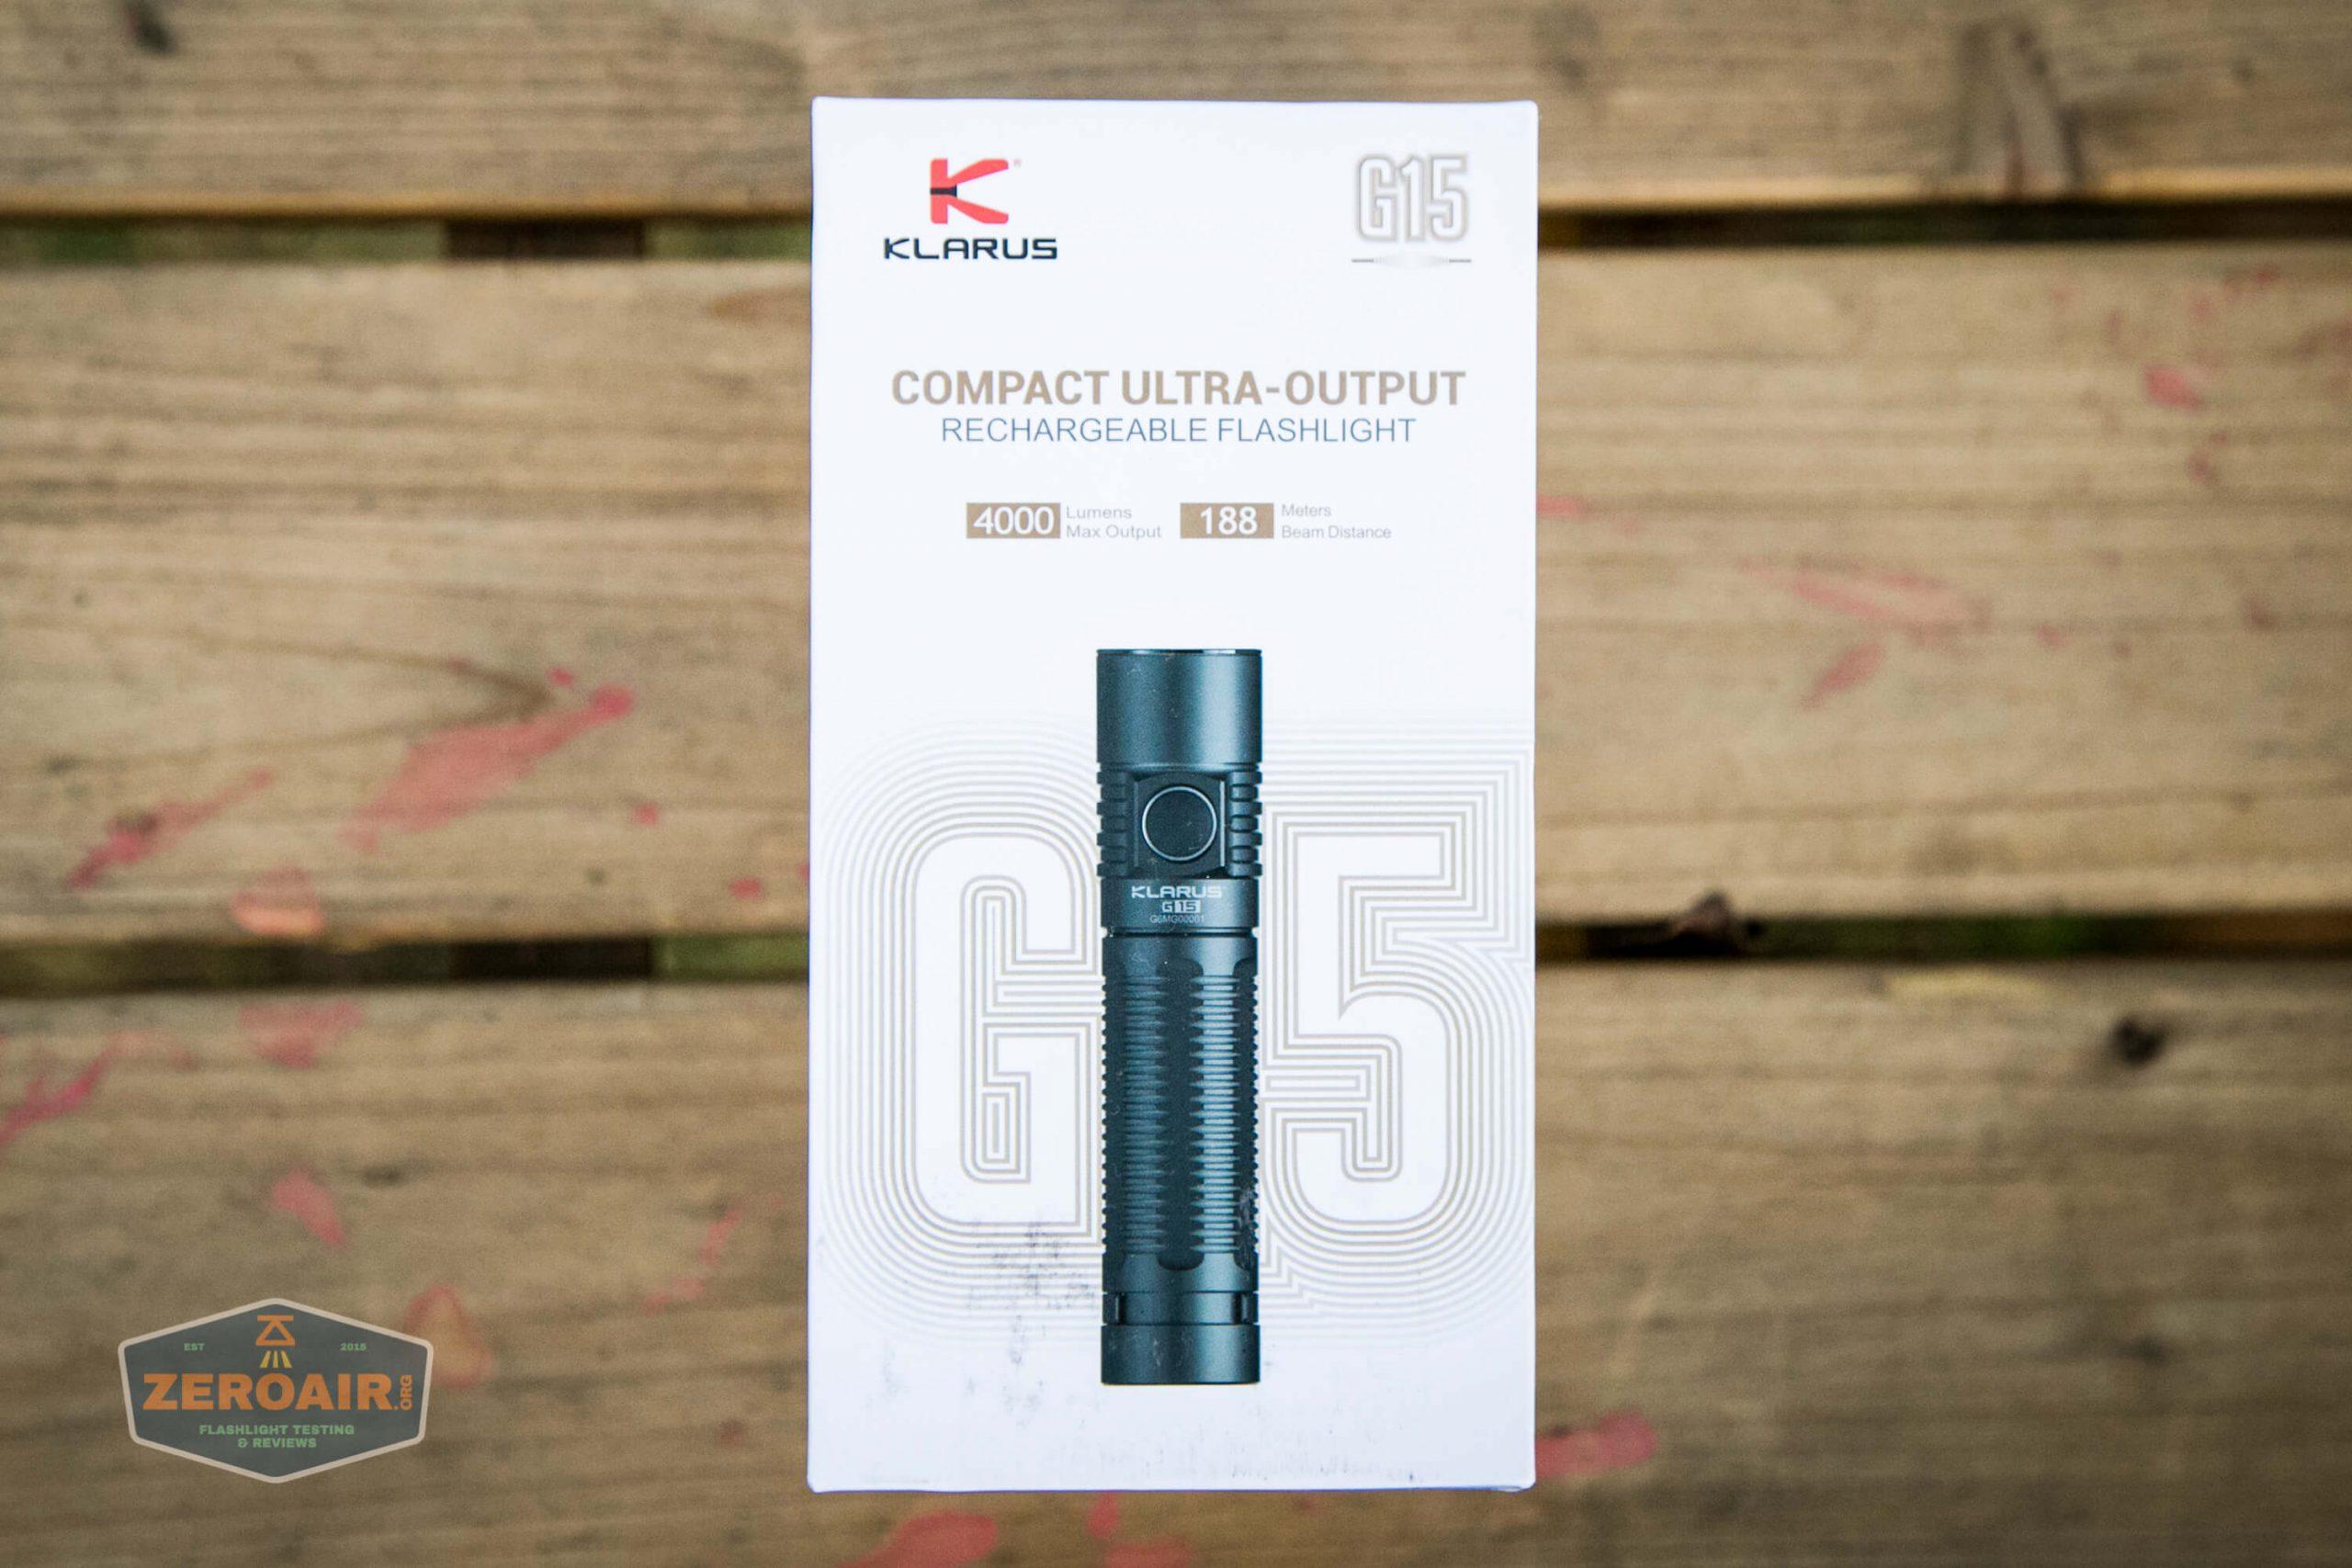 klarus g25 21700 cree xhp70.2 flashlight box front